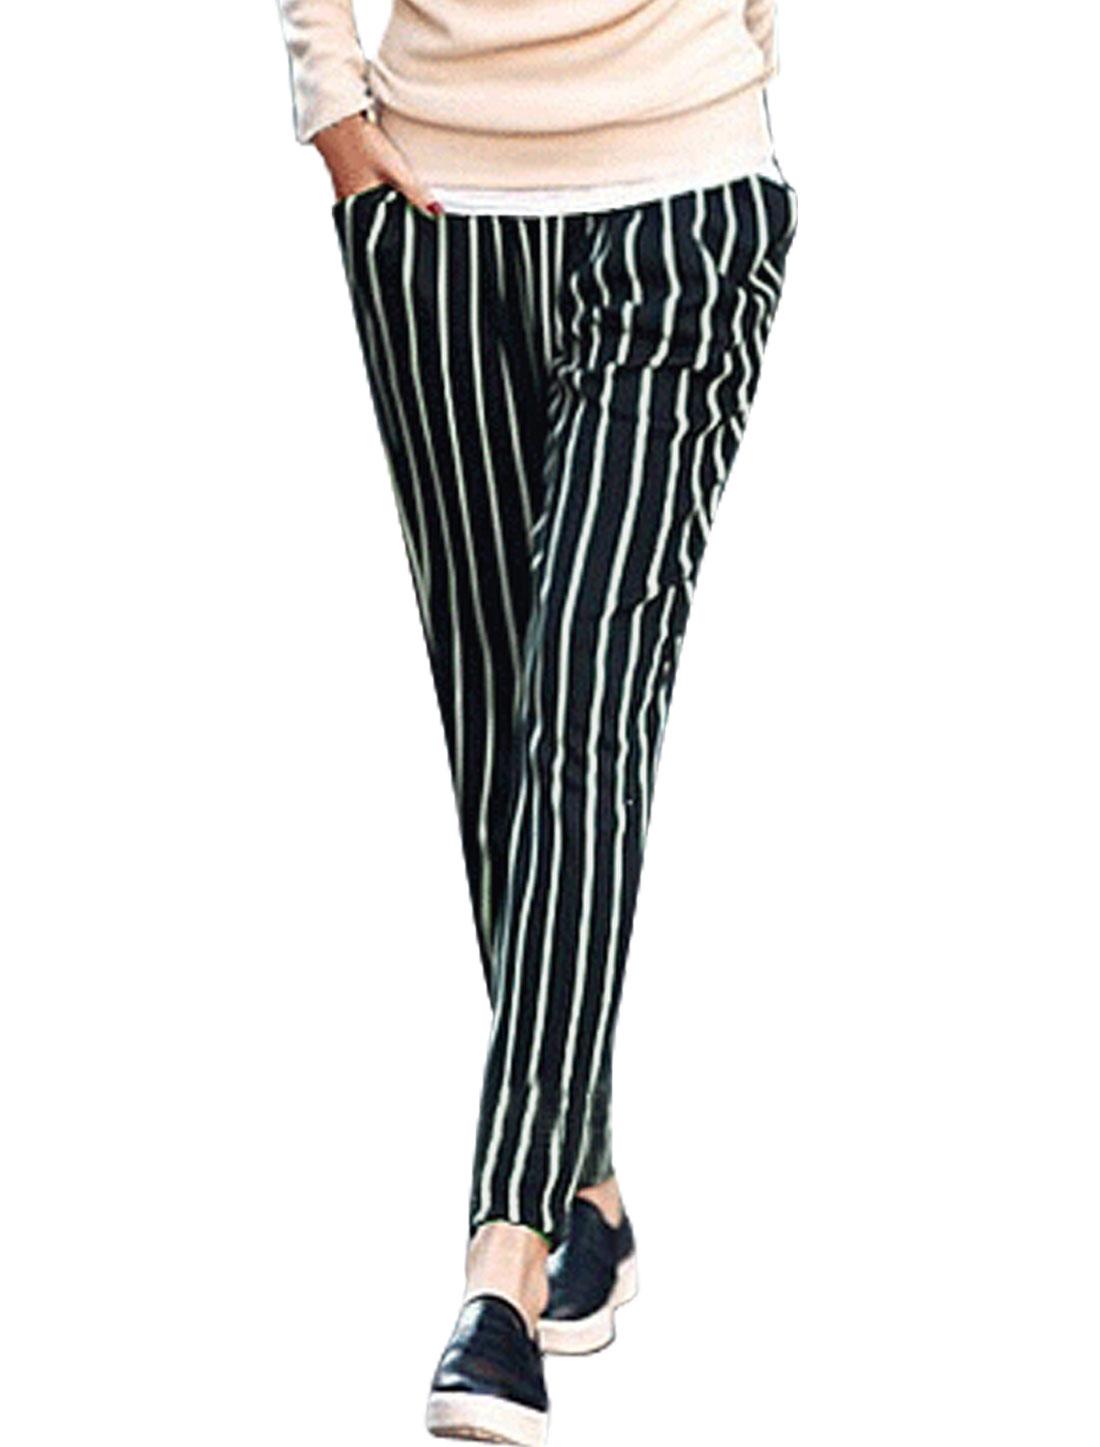 Ladies Mid Rise Drawstring Pockets Casual Stripes Pants Black White XS